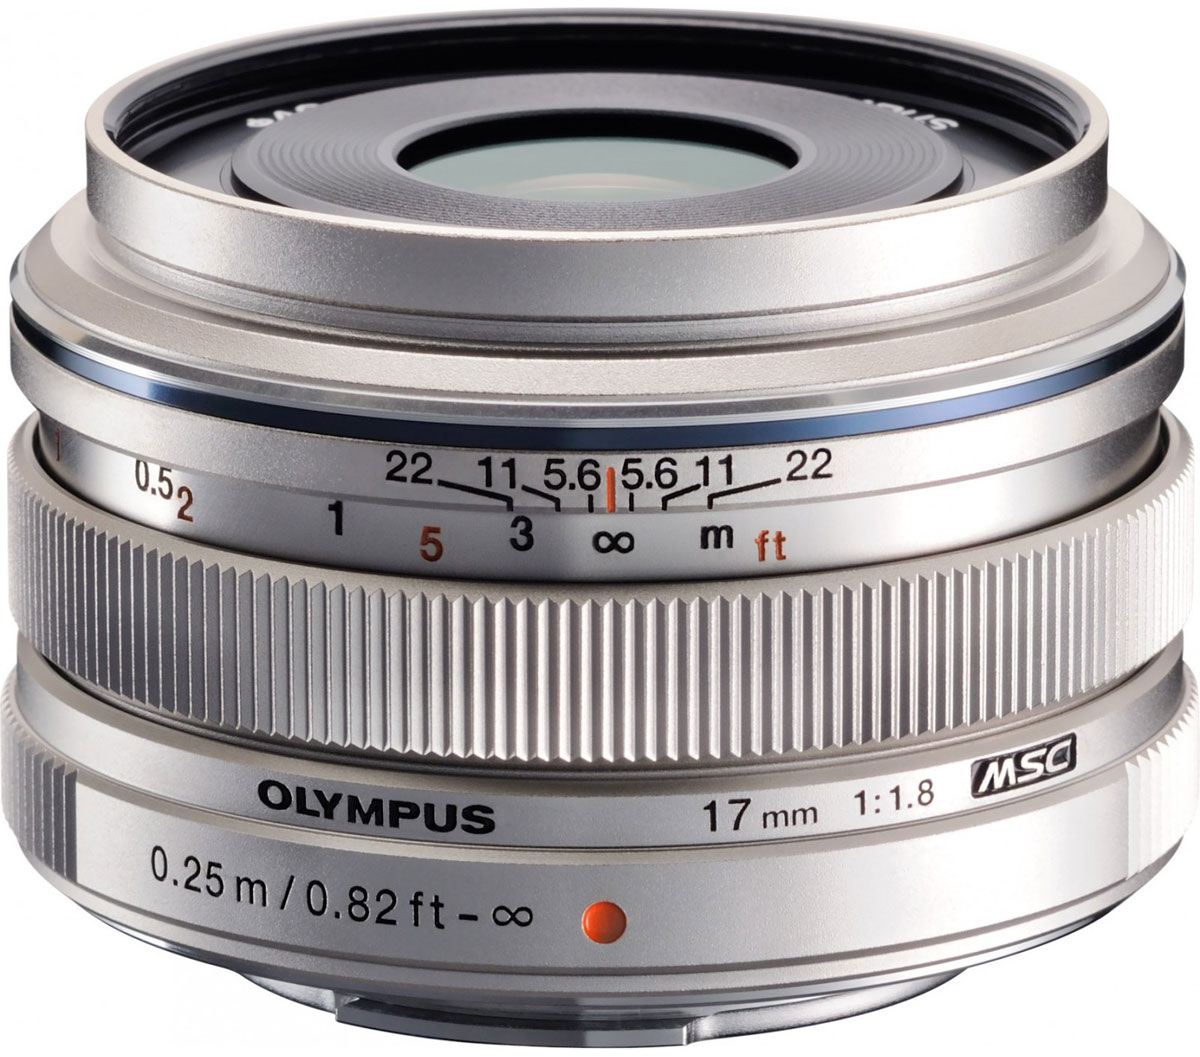 Объектив Olympus M.Zuiko Digital 17mm f/1.8, Silver цена и фото